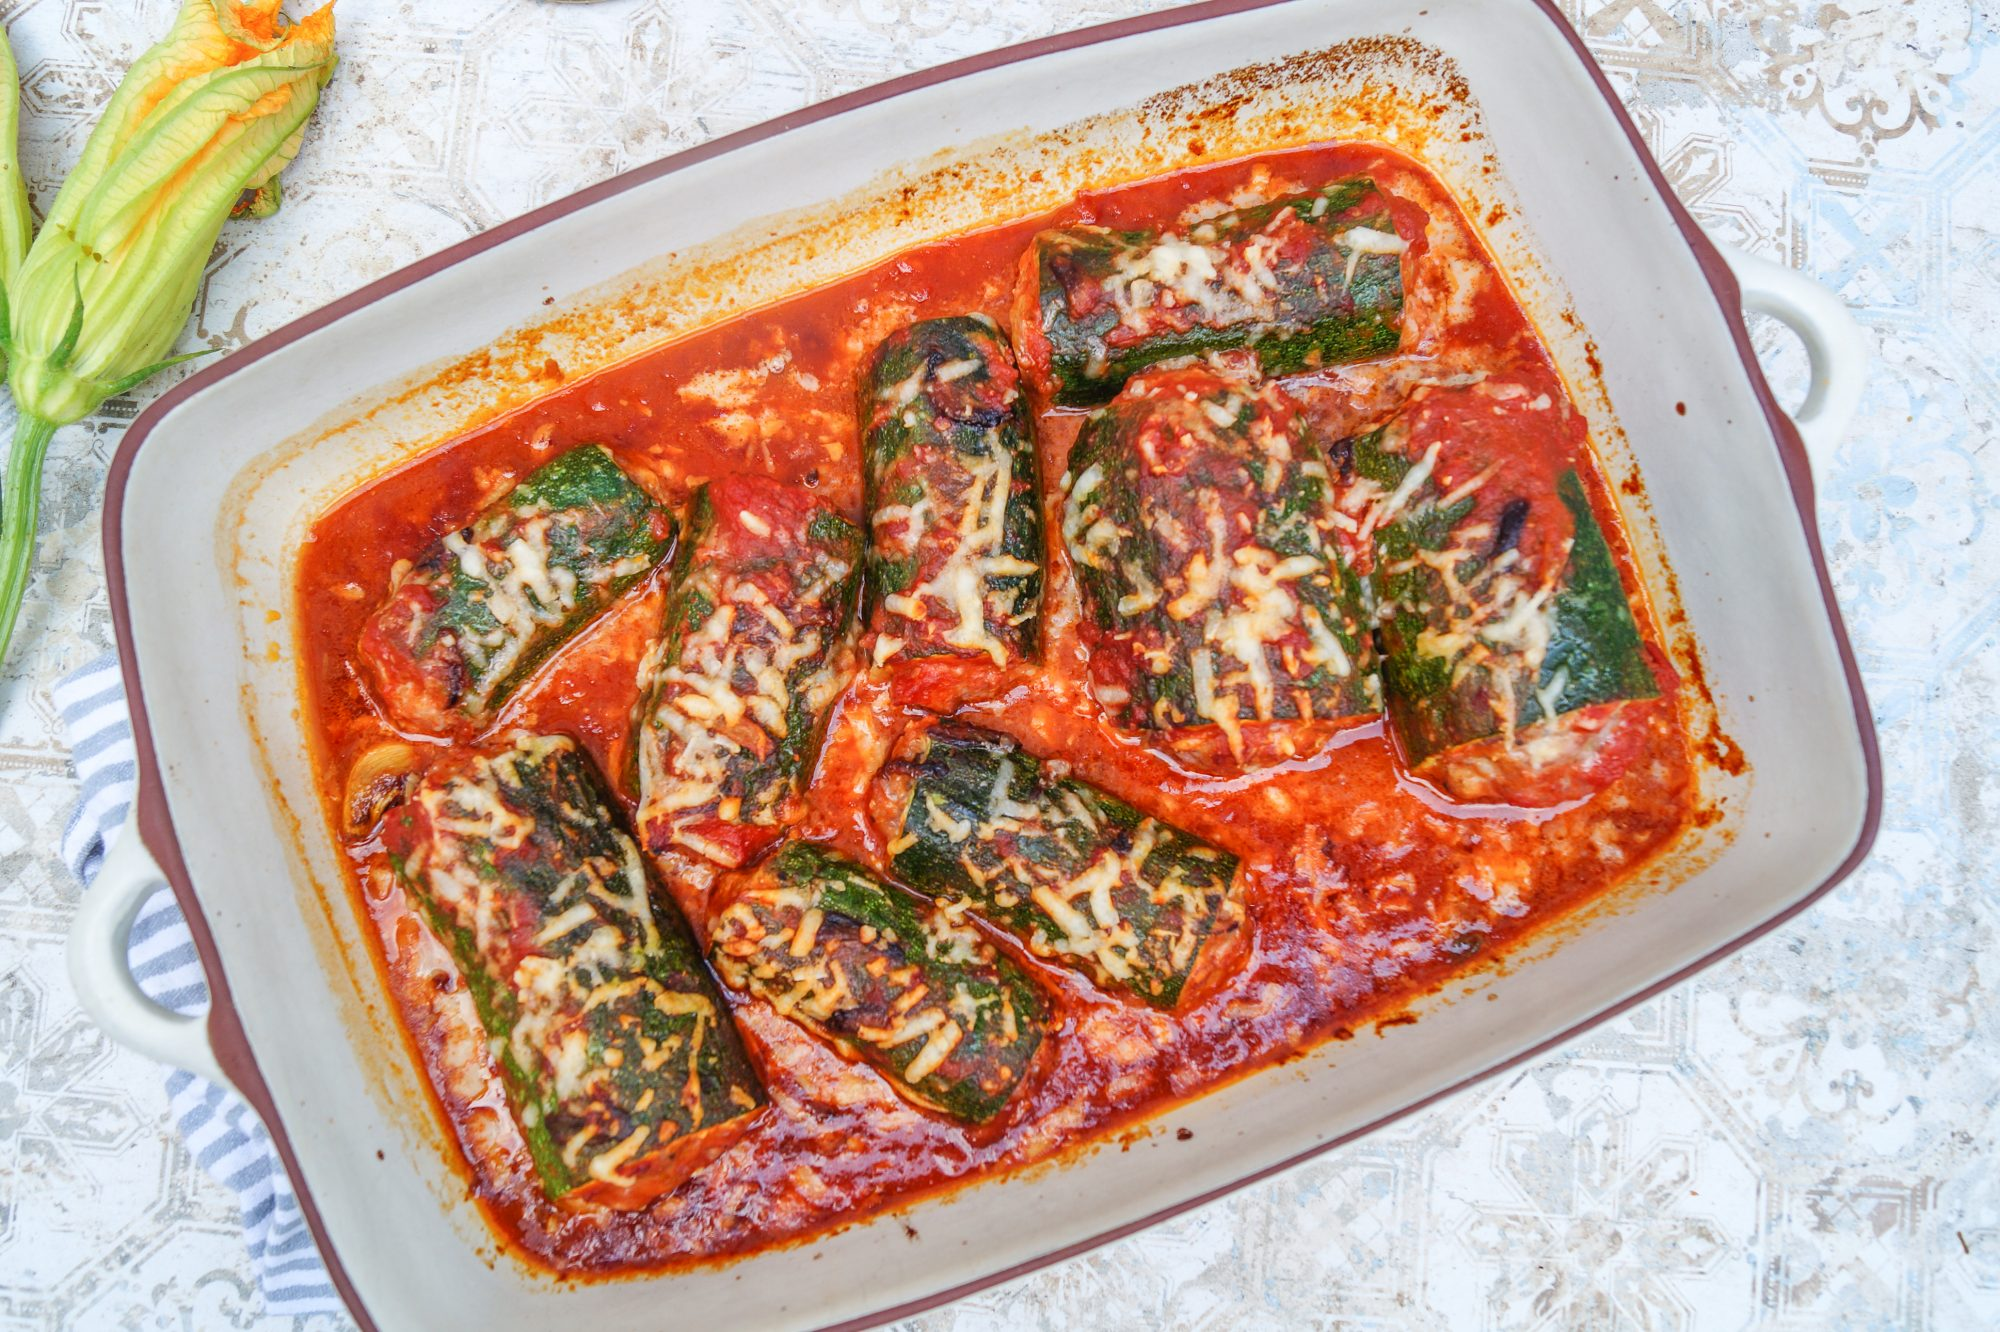 Zucchini ripieni al forno - Gefüllte Zucchini überbacken